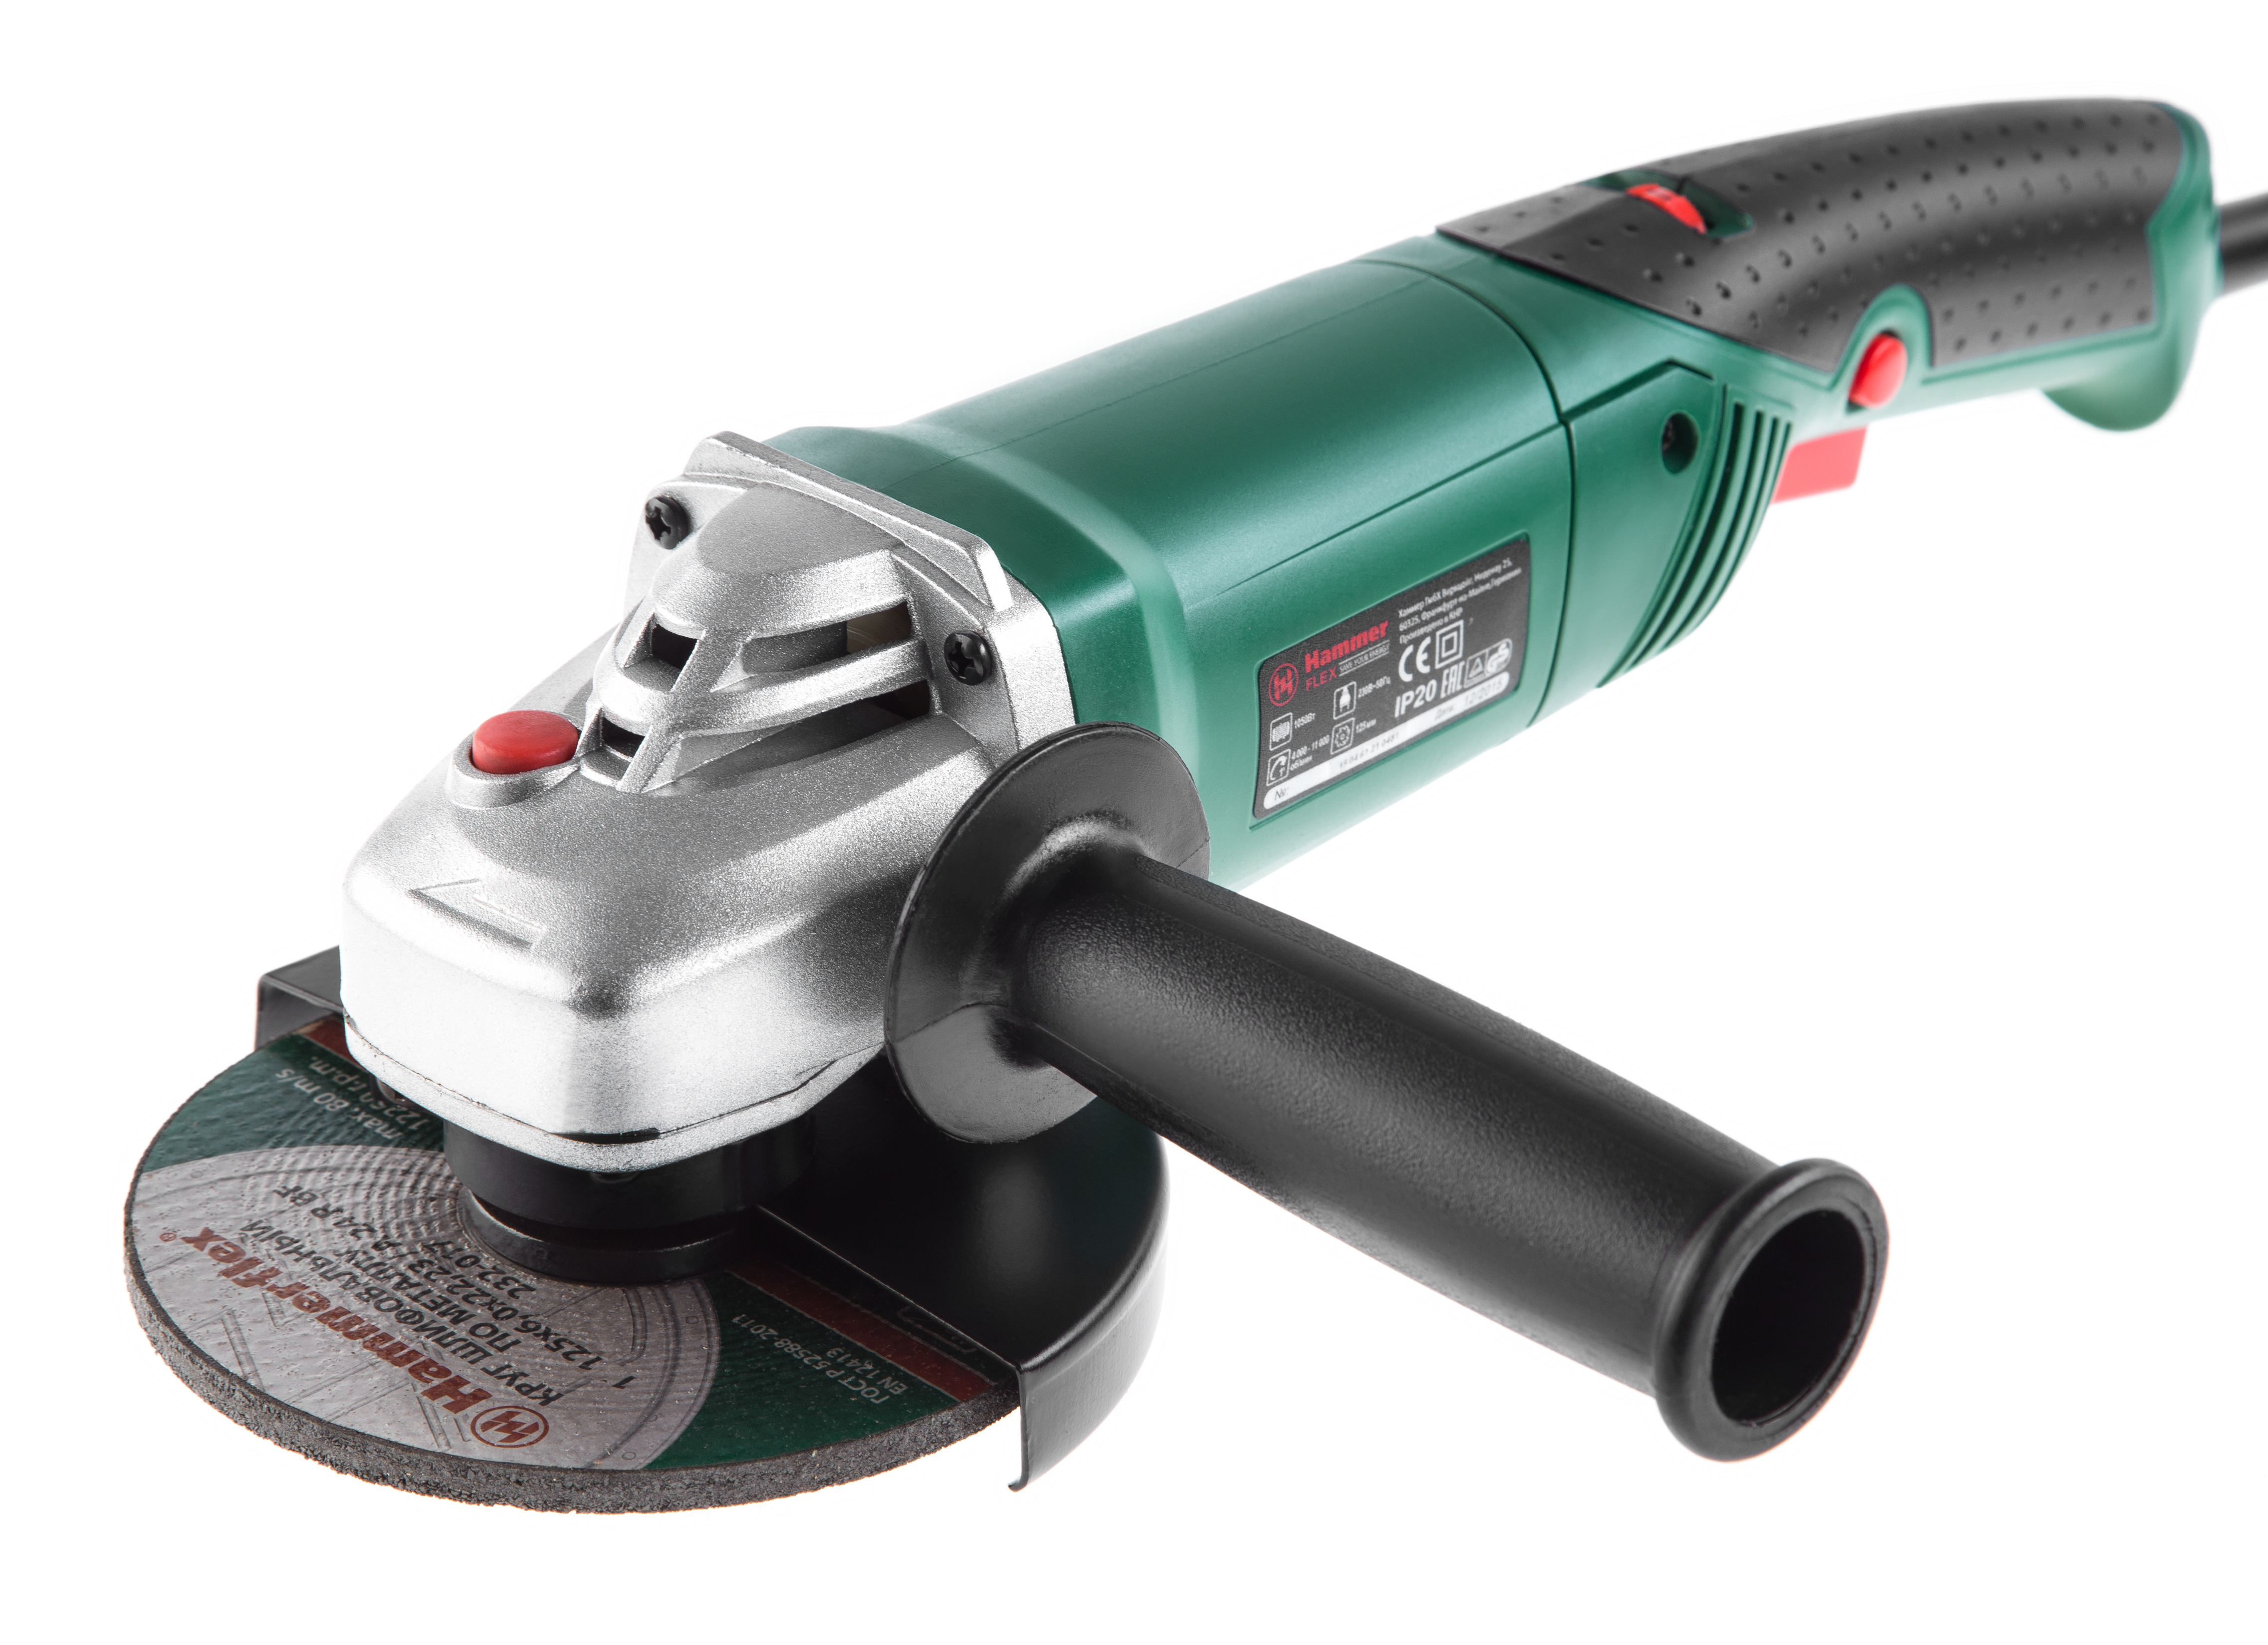 УШМ (болгарка) Hammer Usm1050a